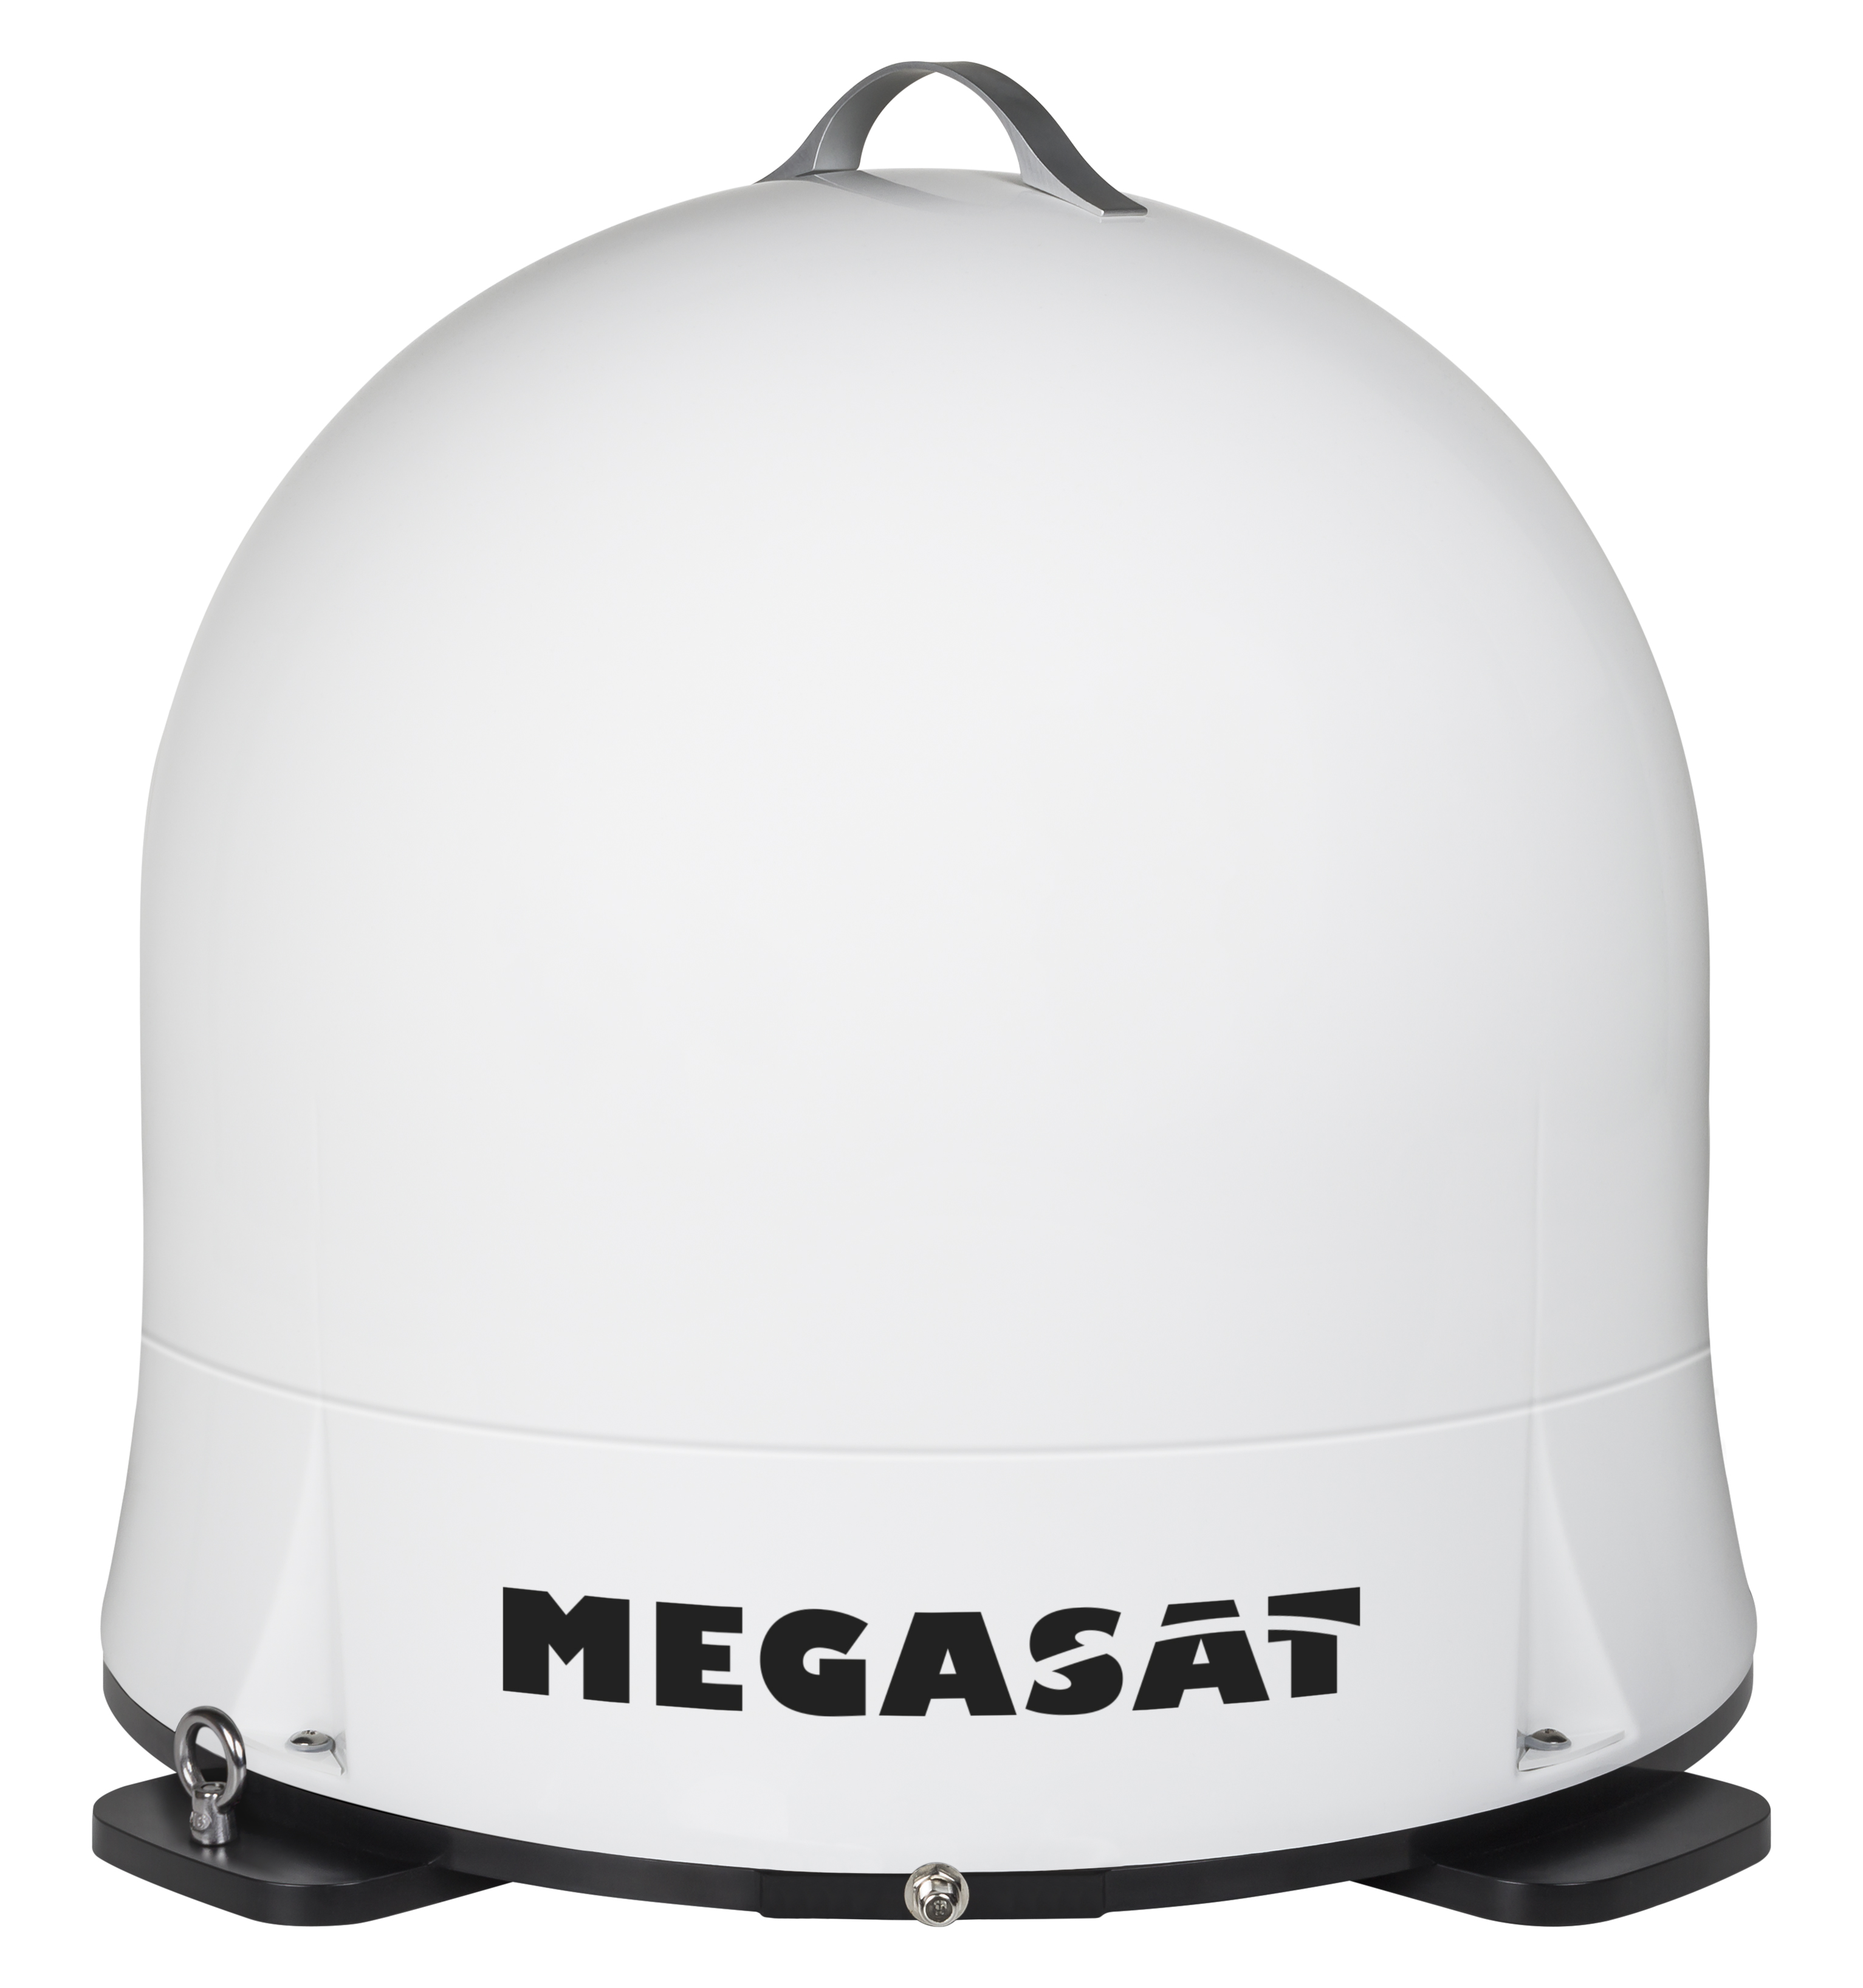 Megasat Campingman Portable ECO